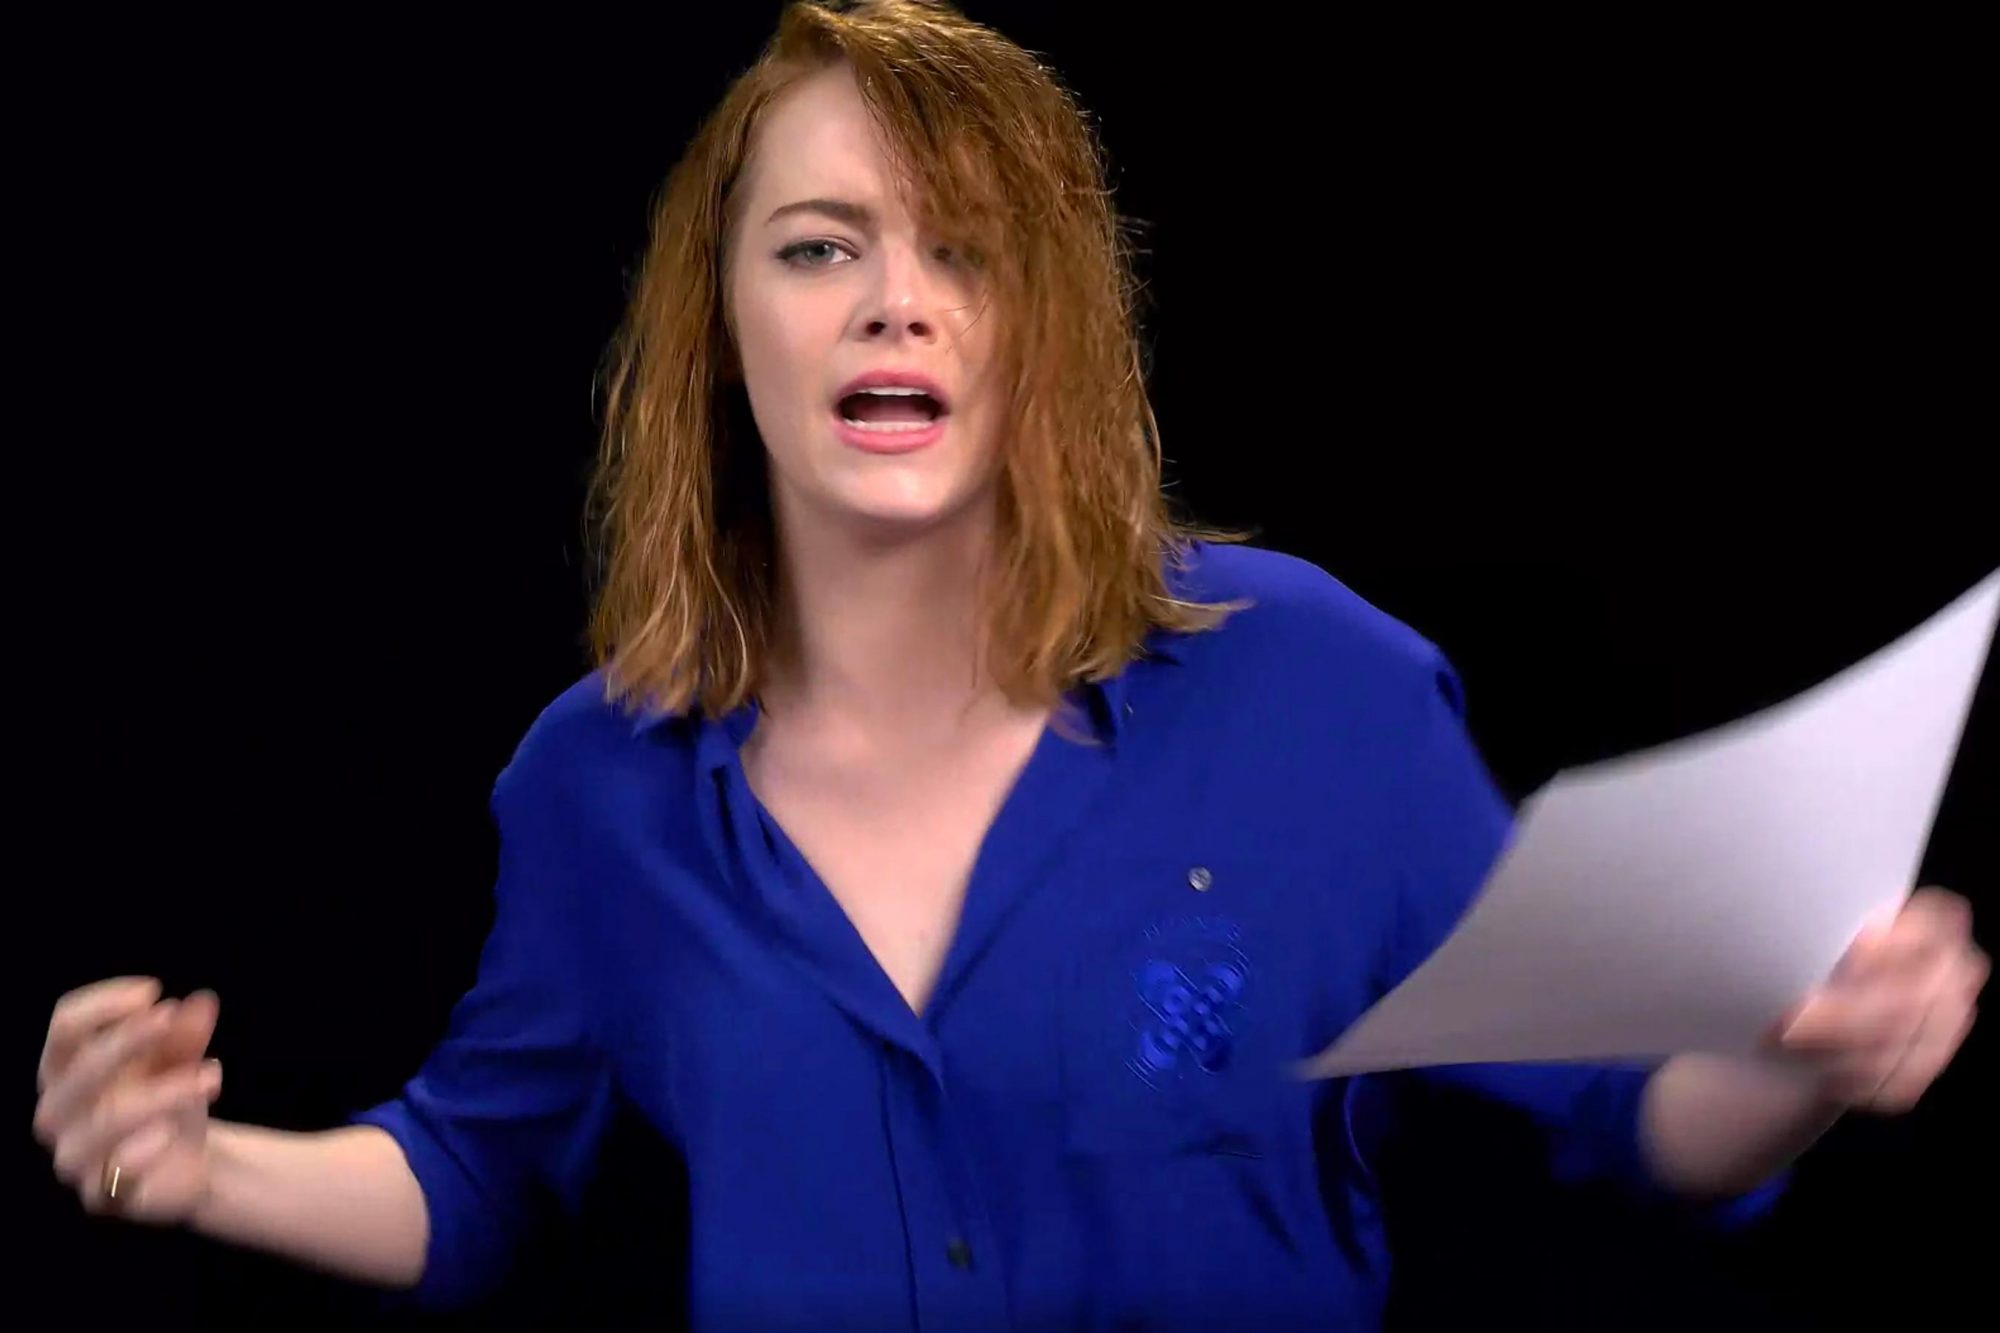 Emma Stone Singing (screen grab)